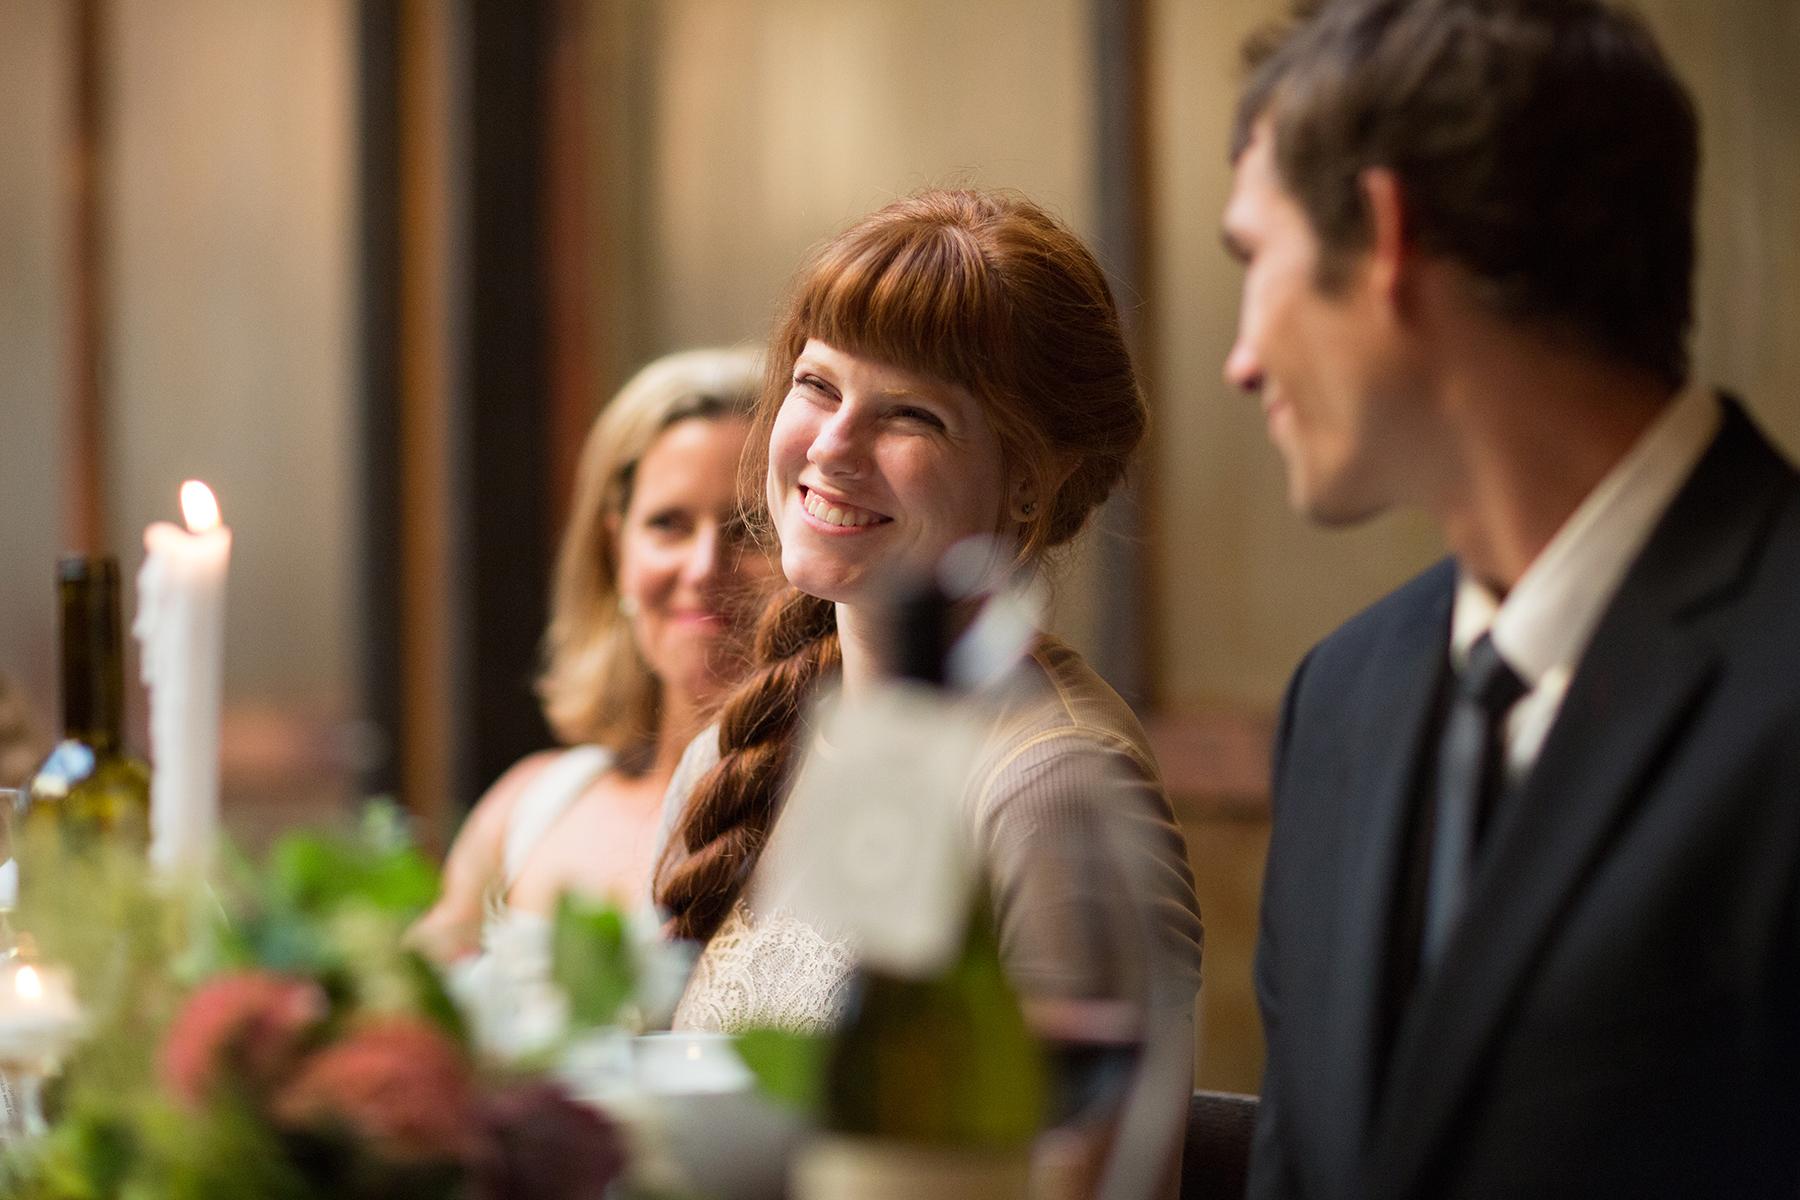 raquelreis_wedding_photography_brooklynwinery_045.jpg